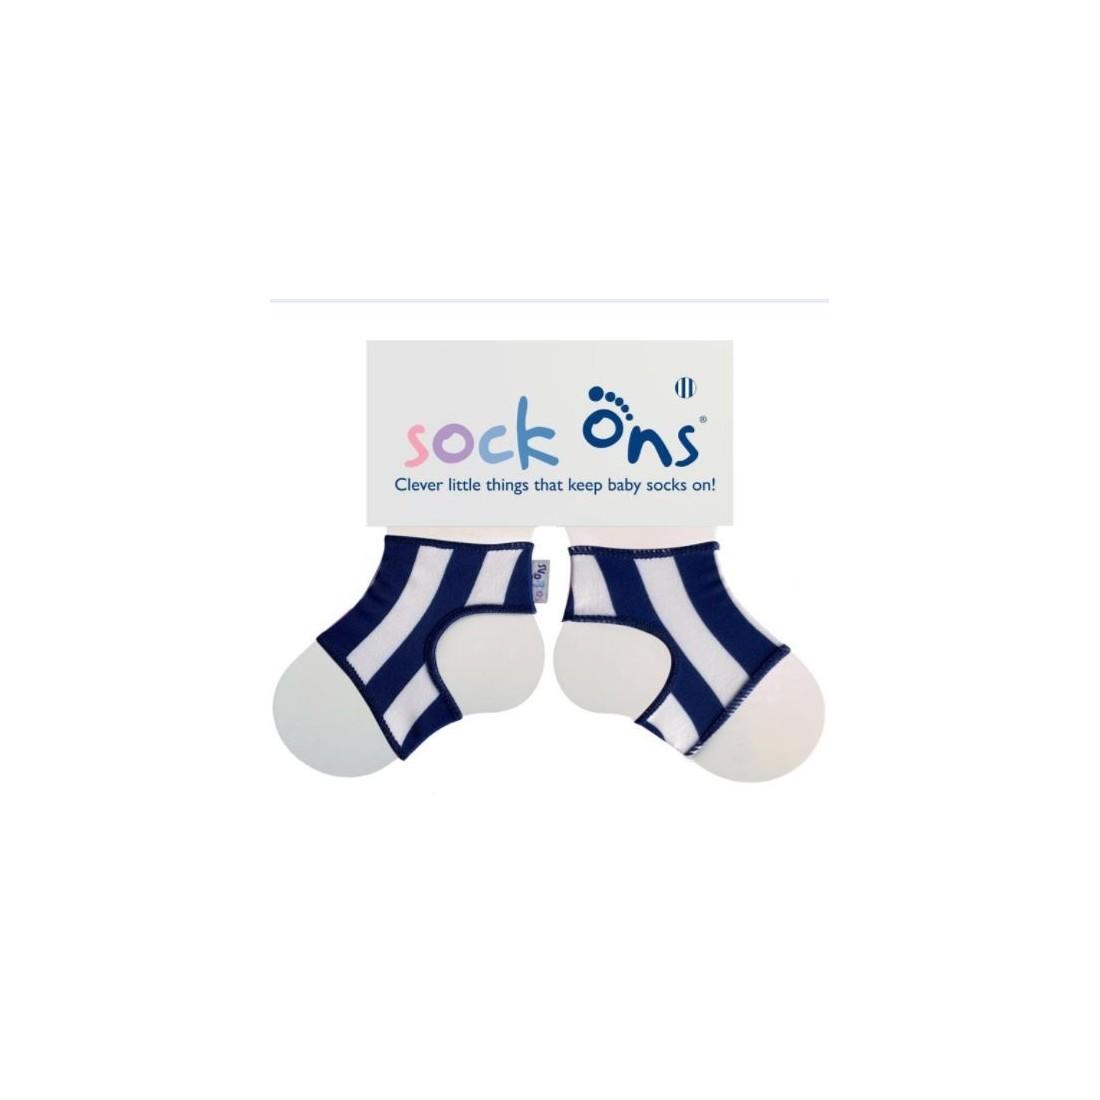 Sock Ons Marin cadeau de naissance original